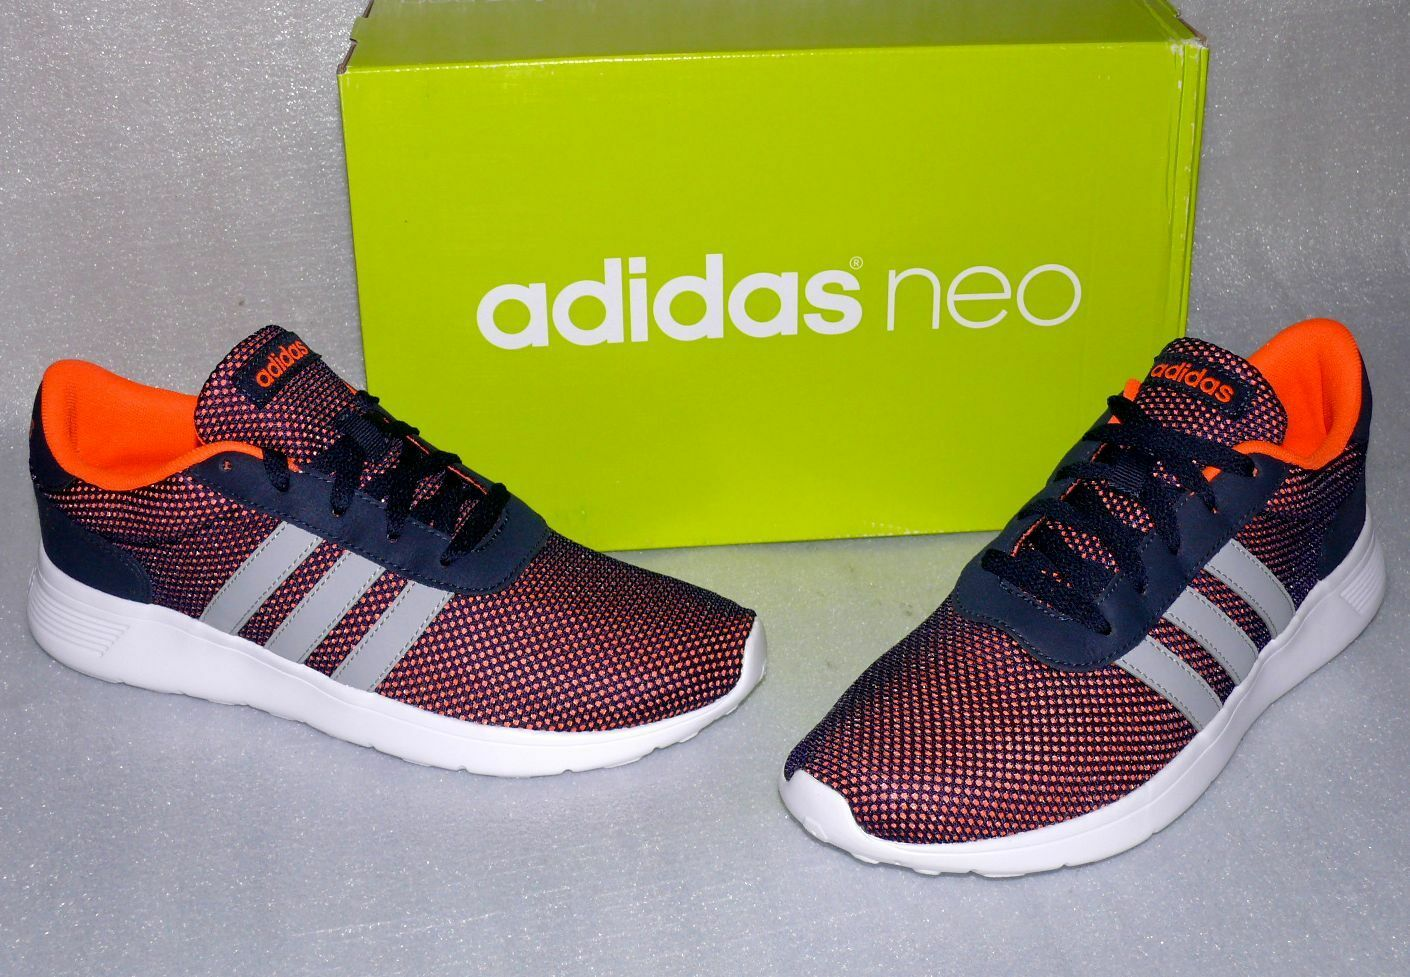 Schuhe Adidas Lite Super Schuhe Racer F99414 Herren Neo 2IEDYWH9